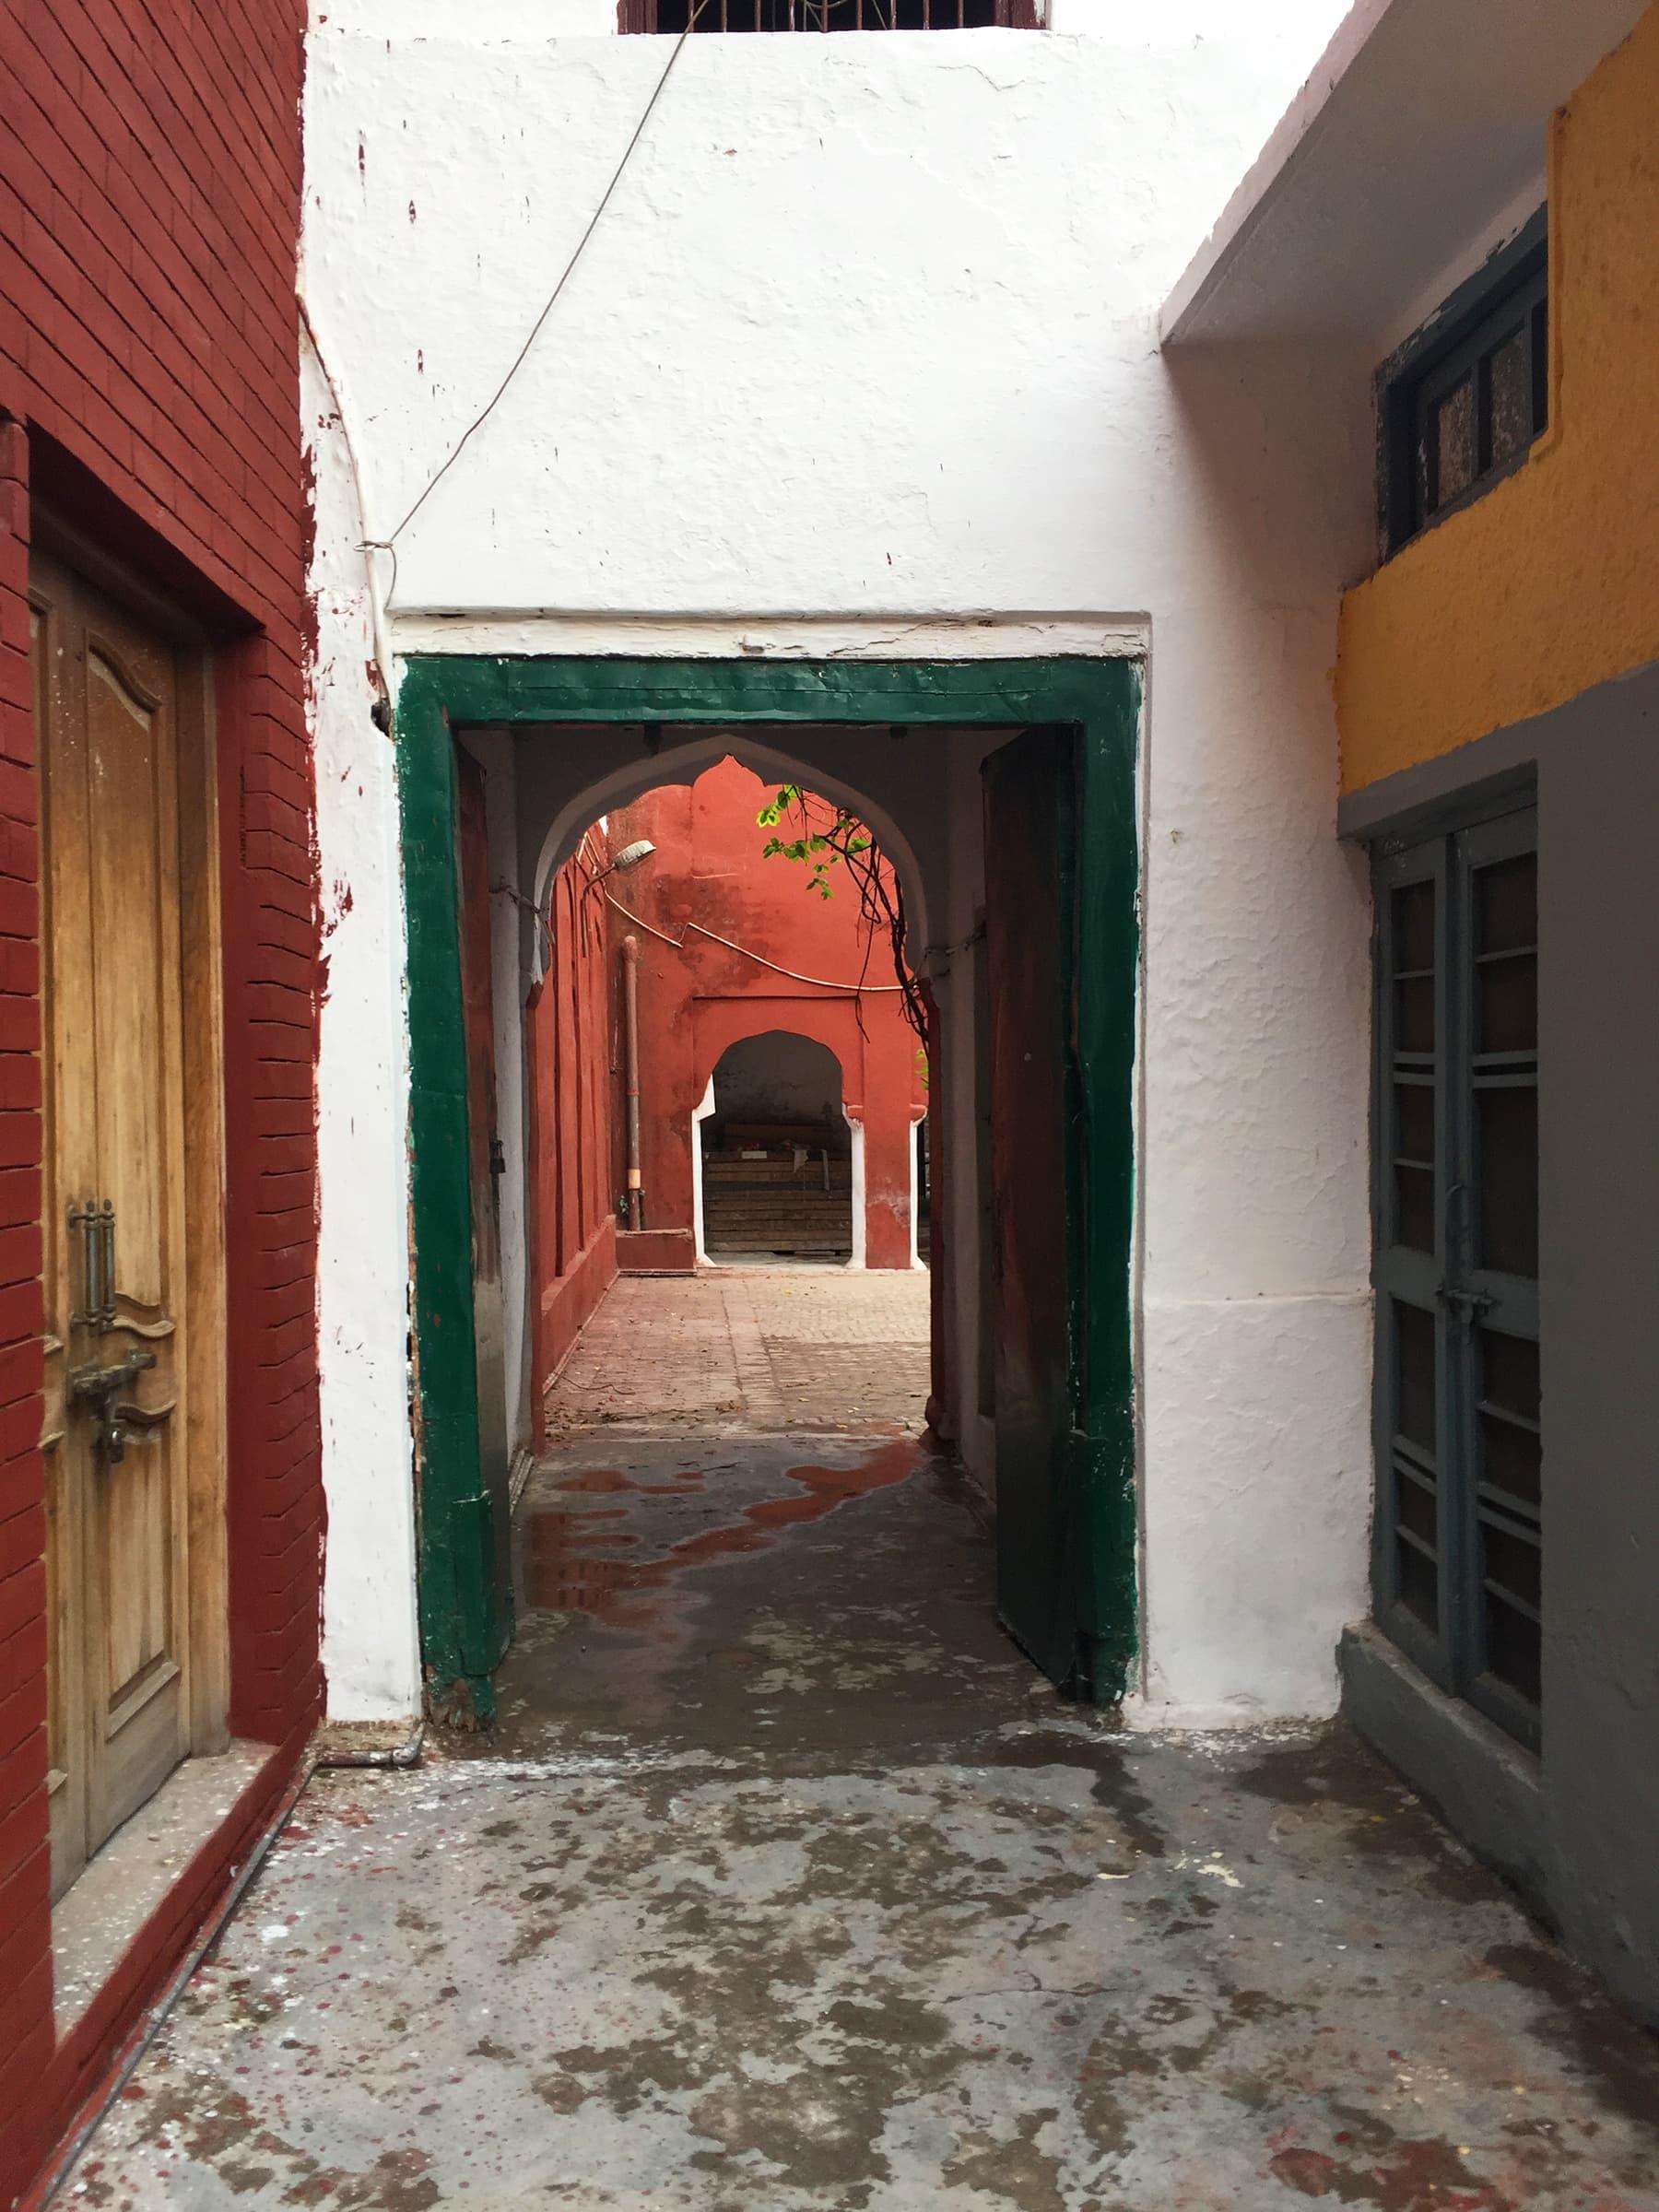 The passage way leading to the courtyard in Mubarak 'haveli'. —Taimur Shamil